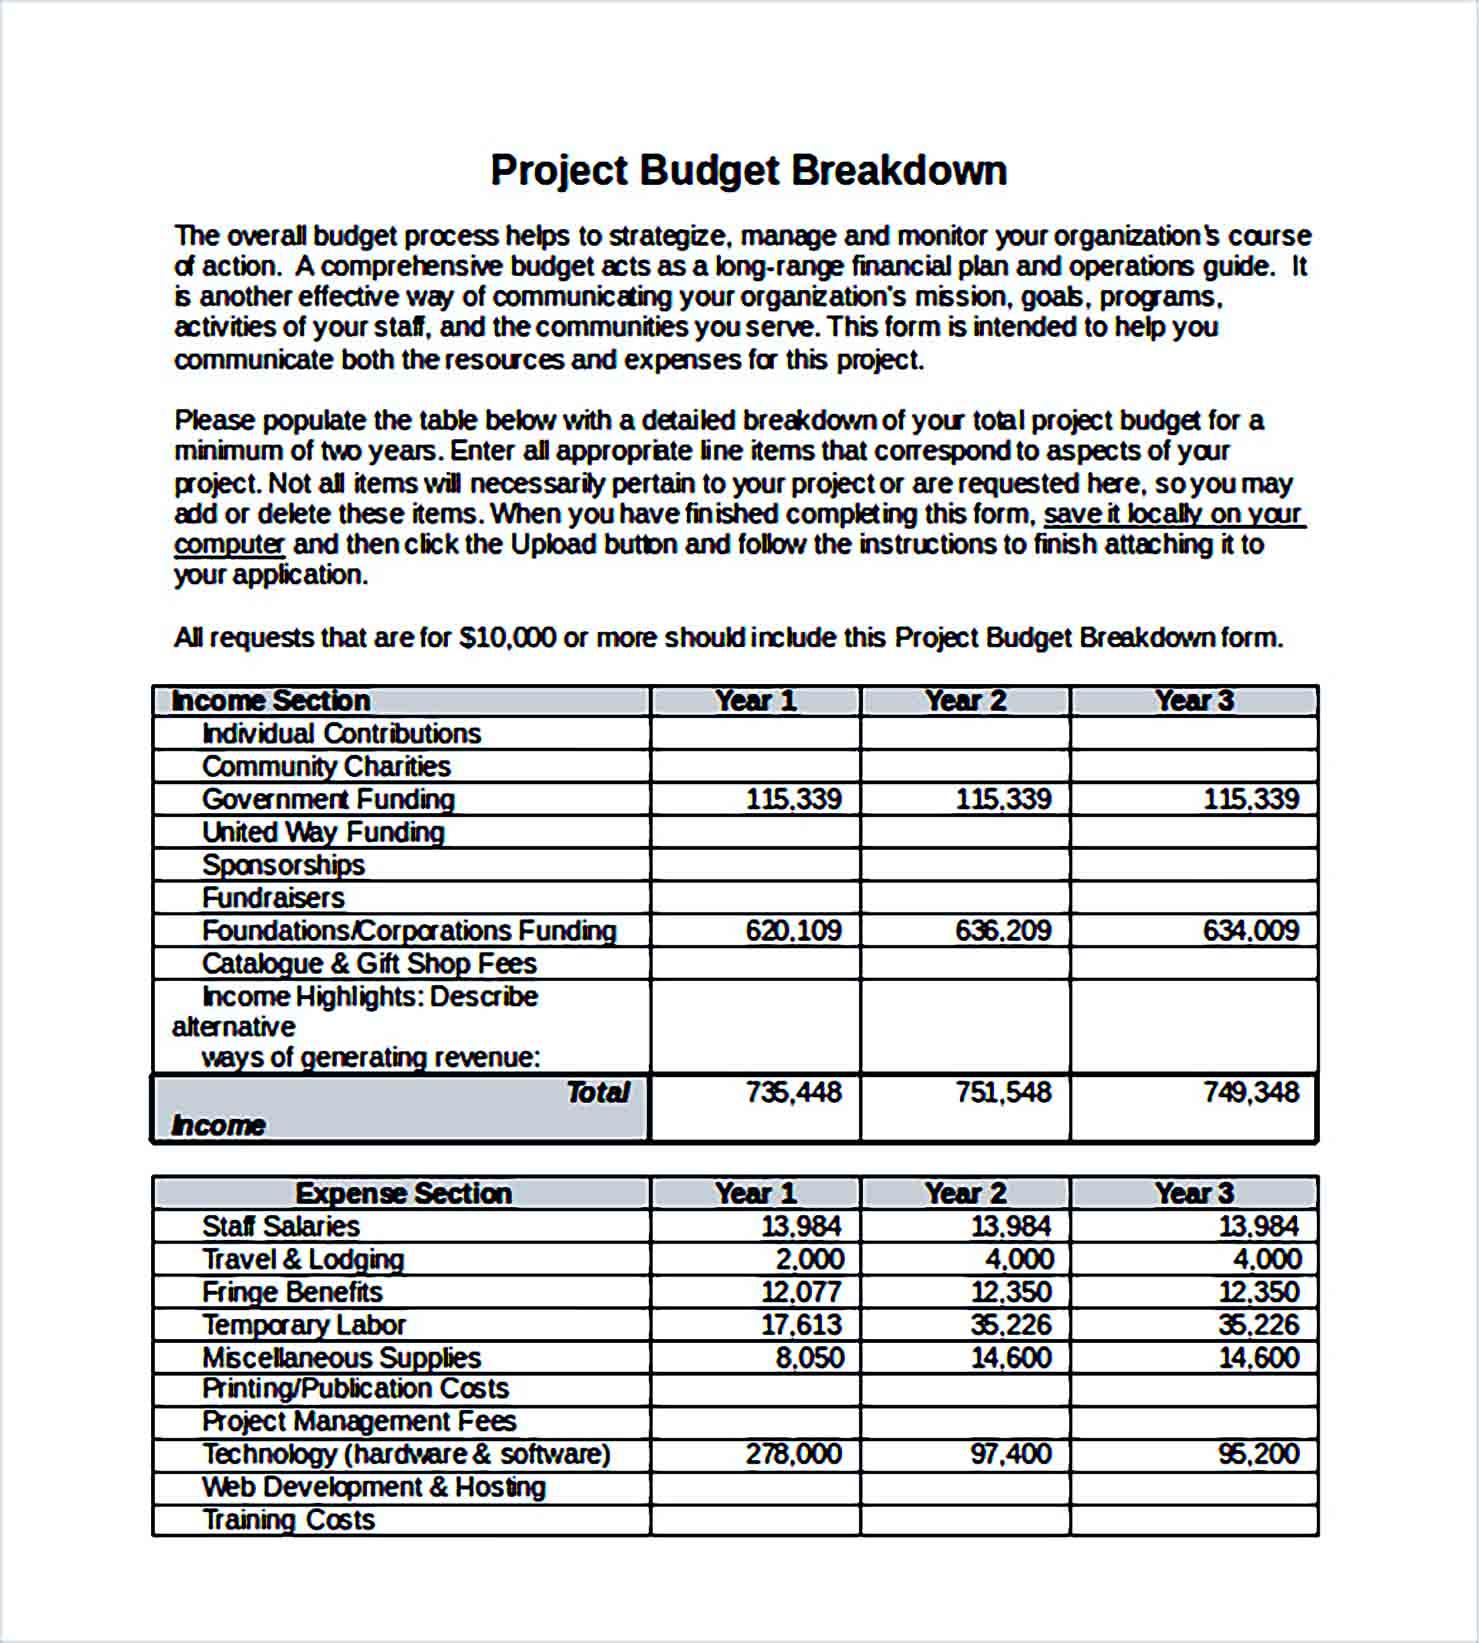 Sample Project Budget Breakdown